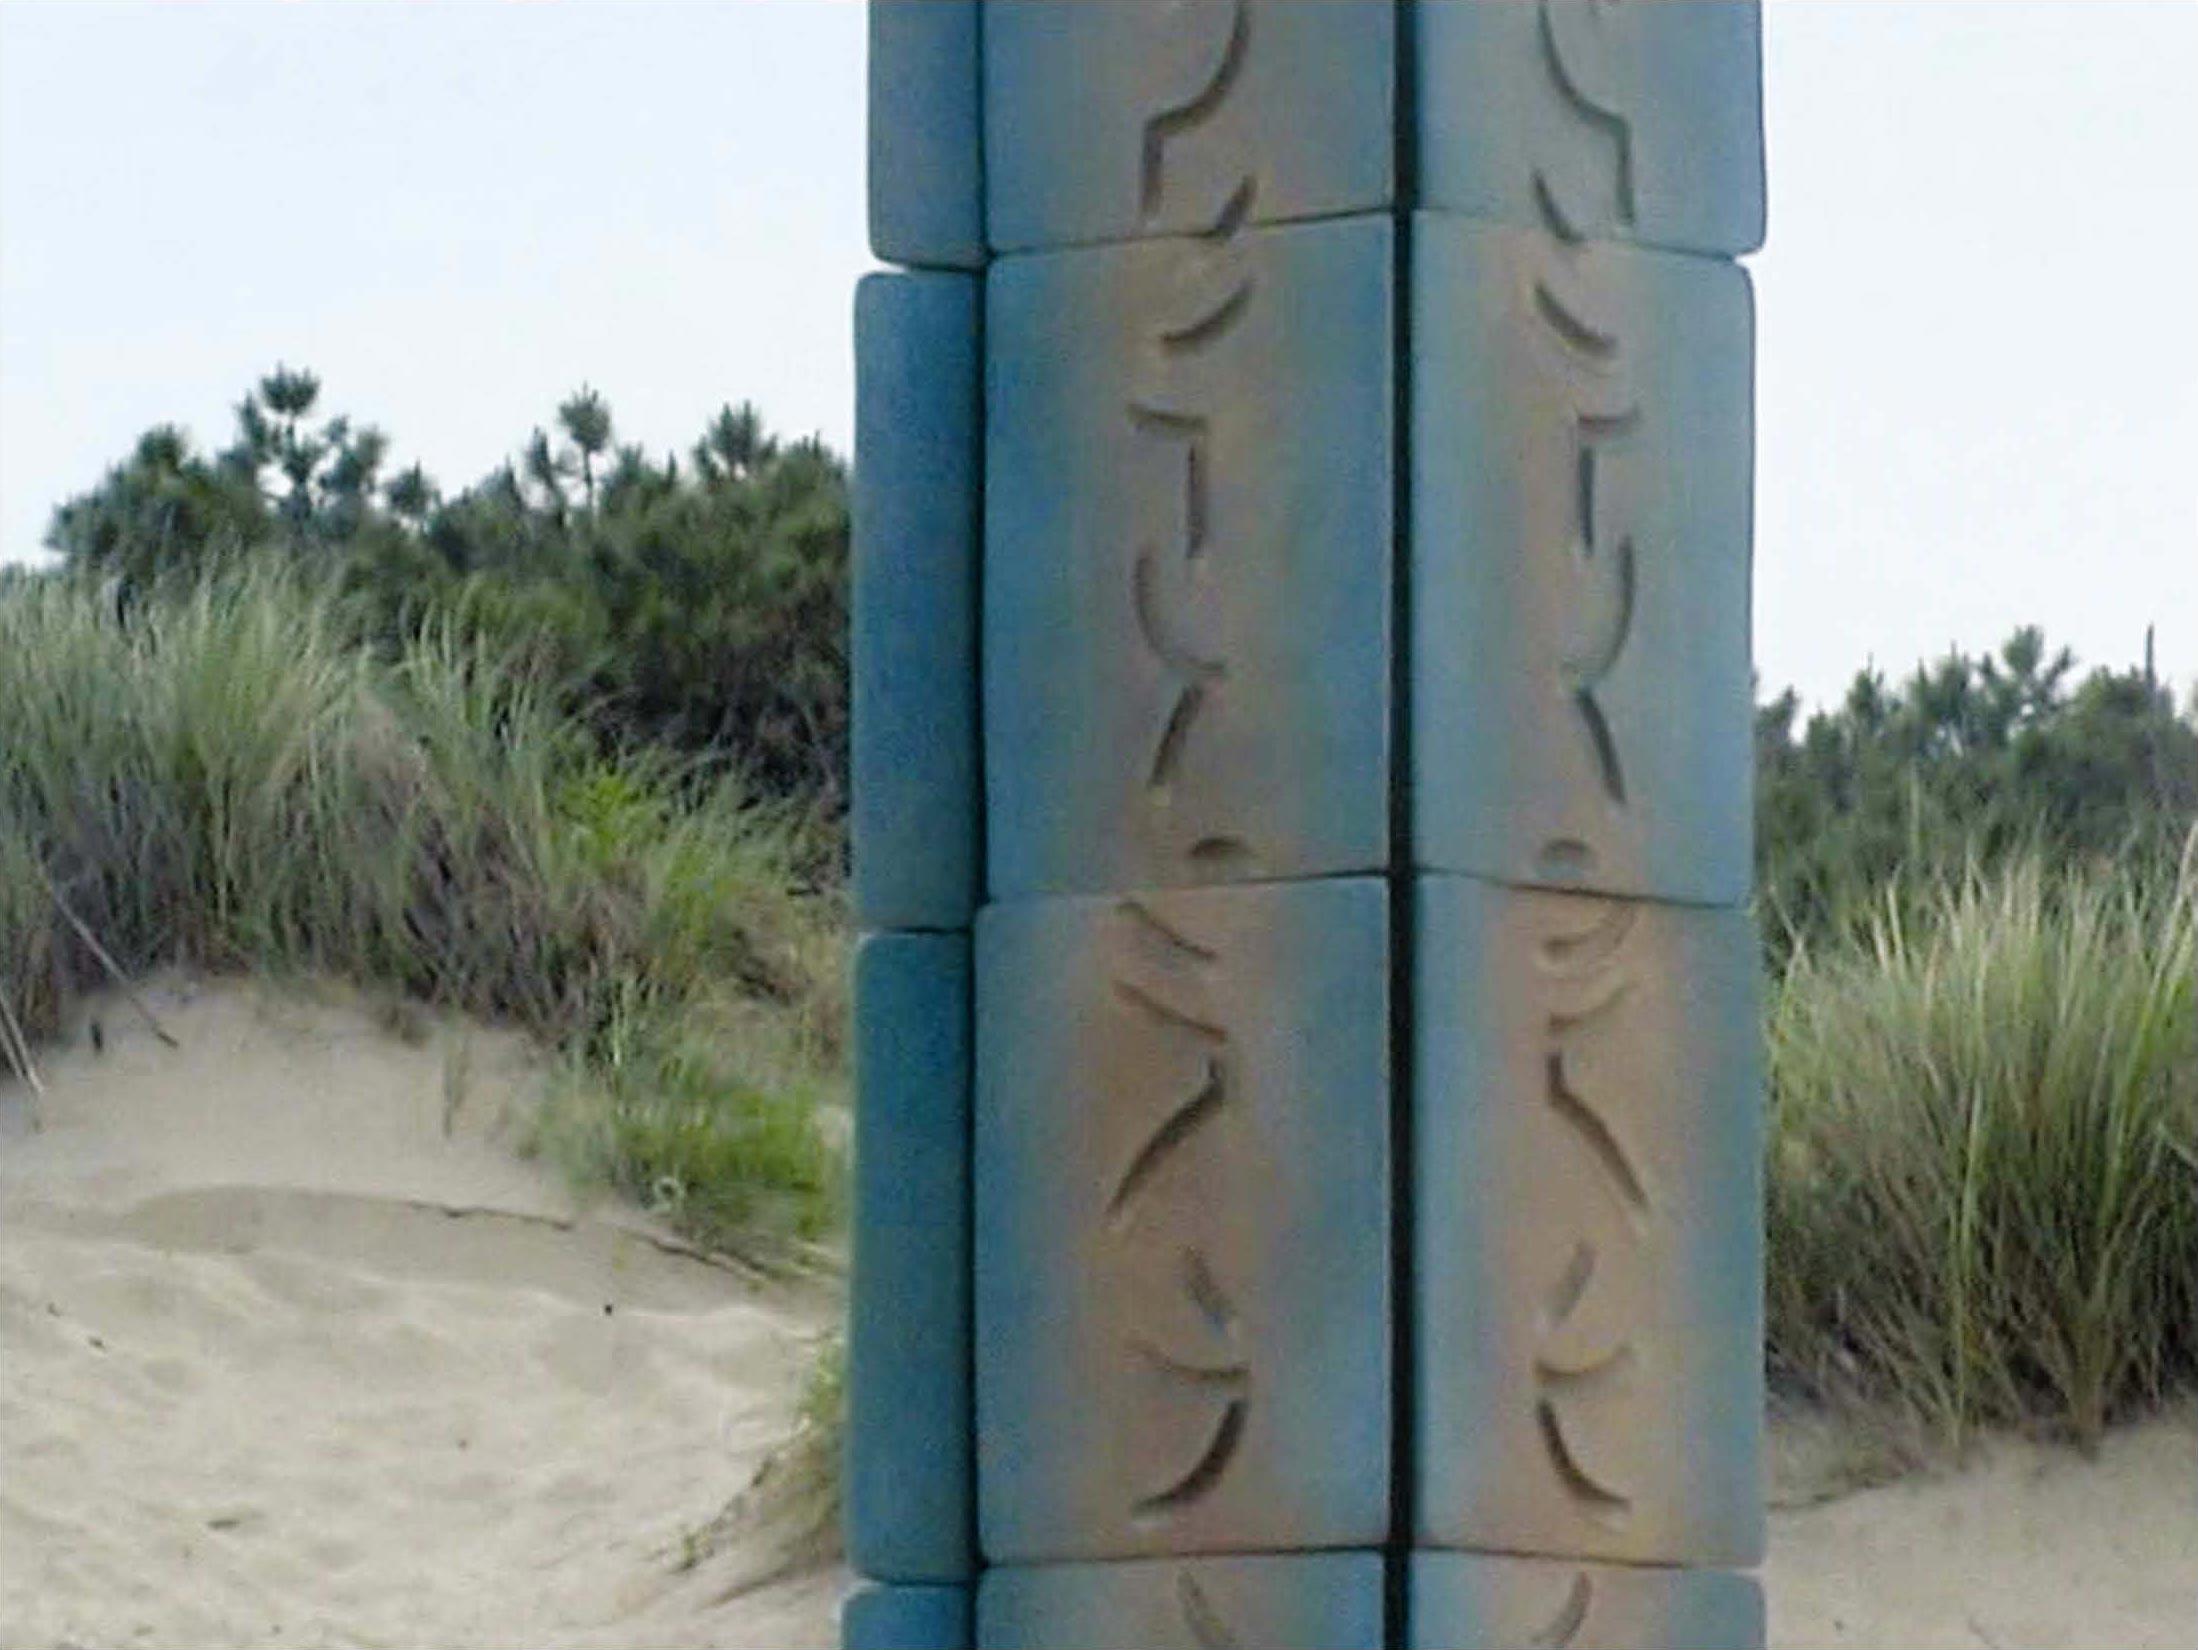 La stele dedicata al mare